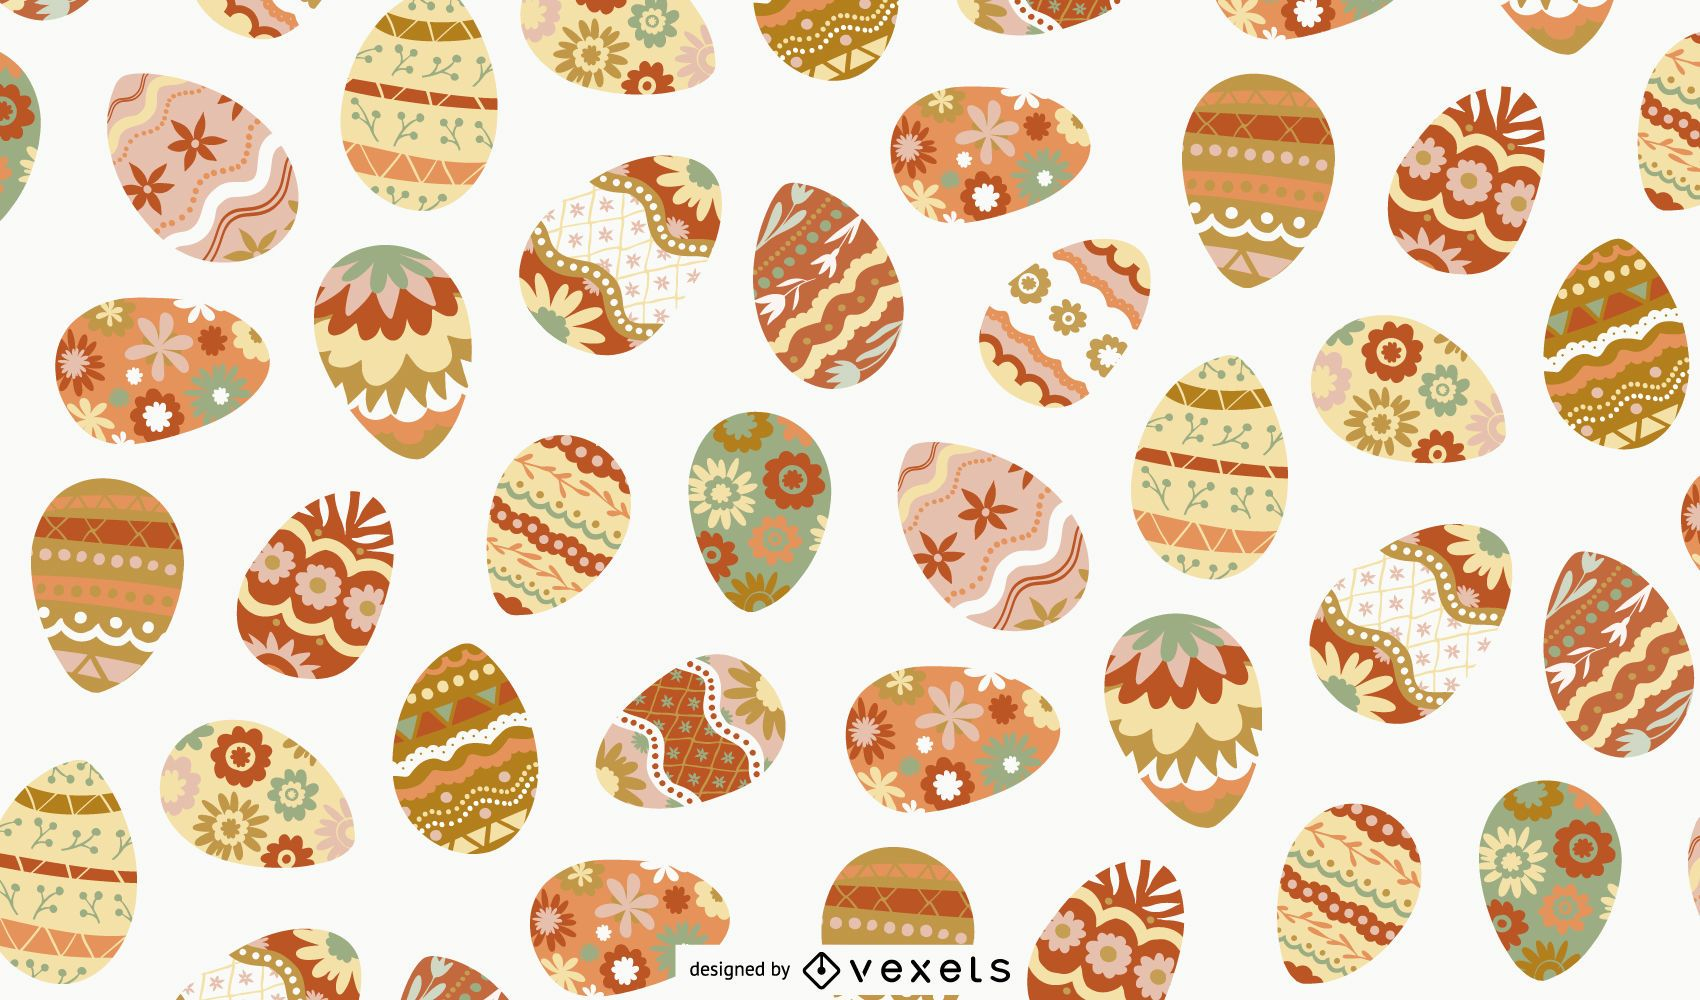 Diseño de patrón de huevos decorados de Pascua